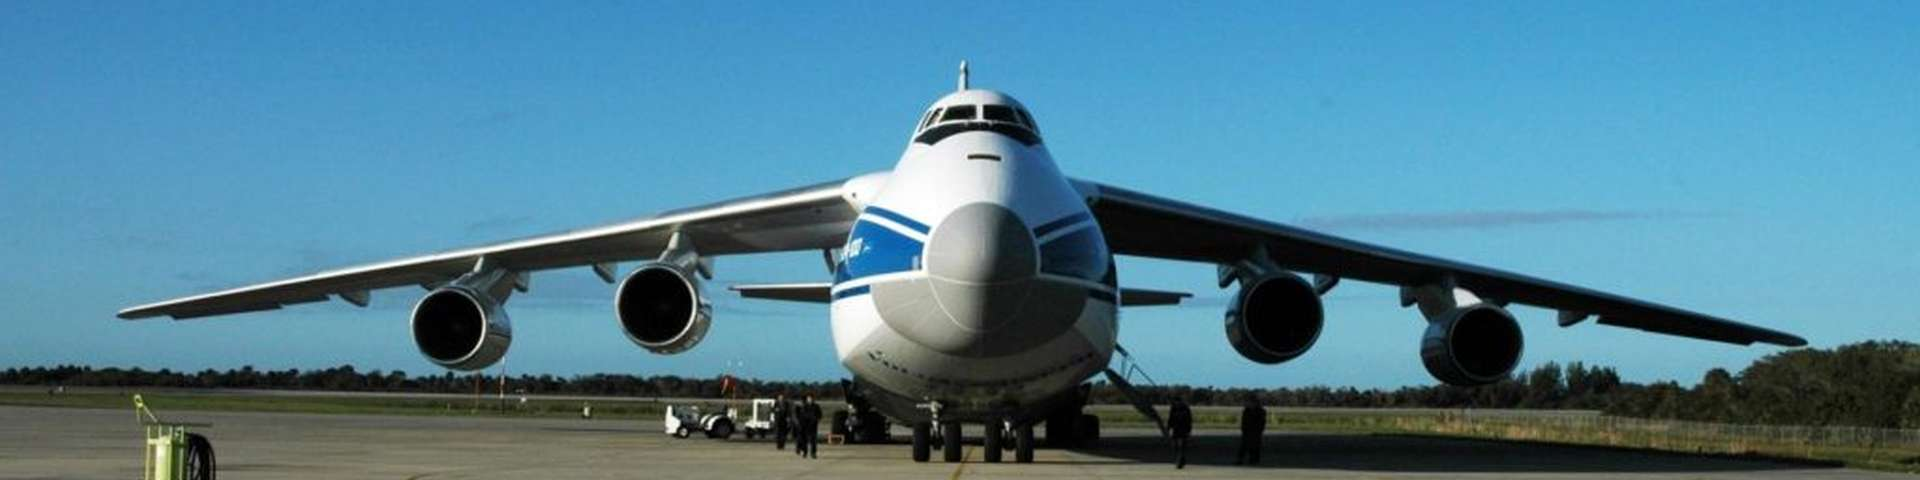 Banner Grootste vliegtuigen ter wereld 1 (bron: Pixabay)